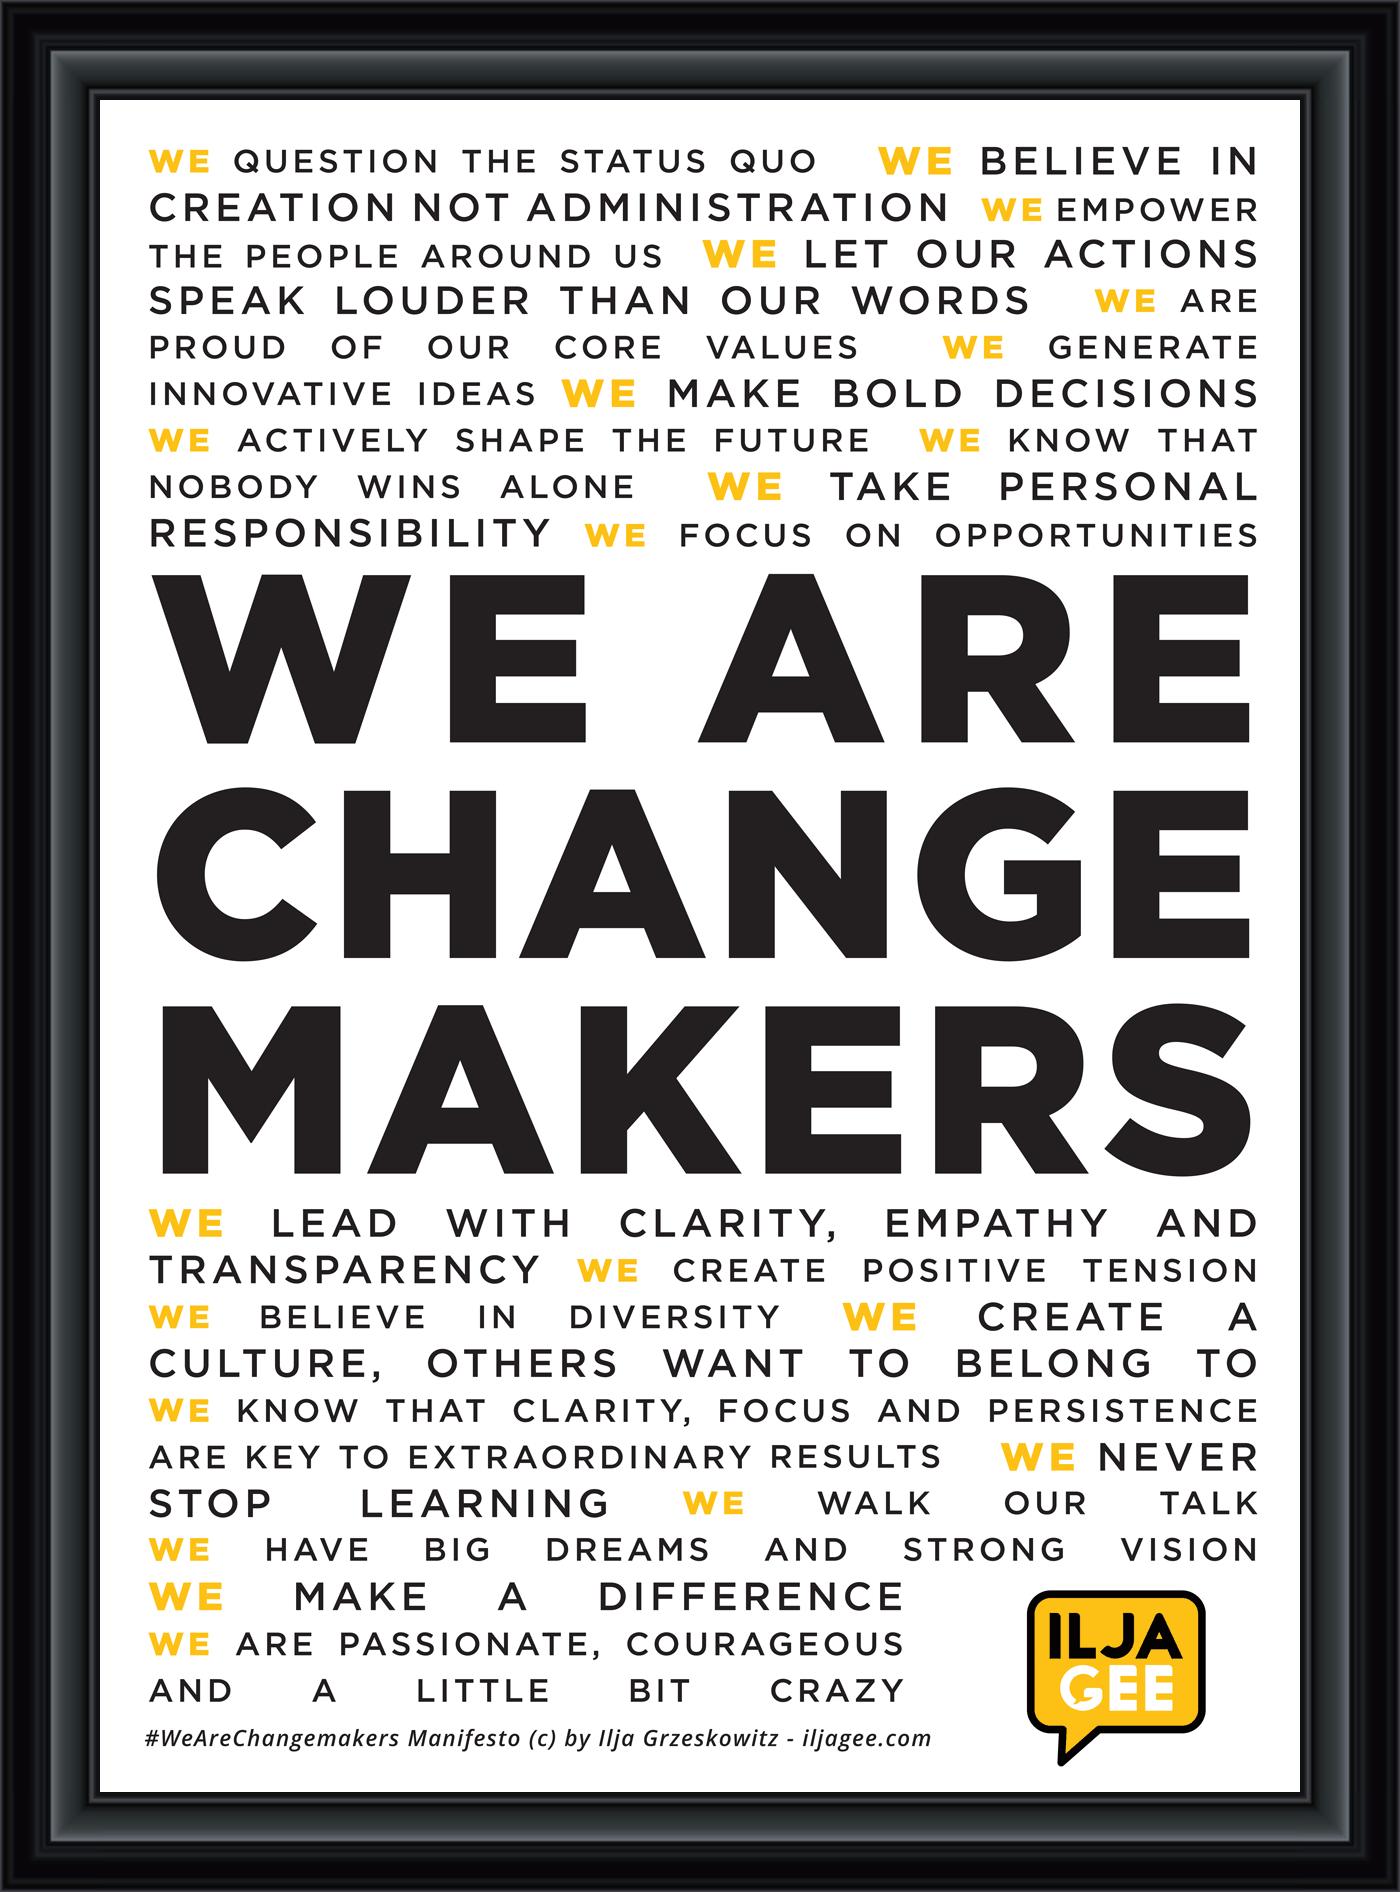 Changemaker Manifesto Ilja Gee